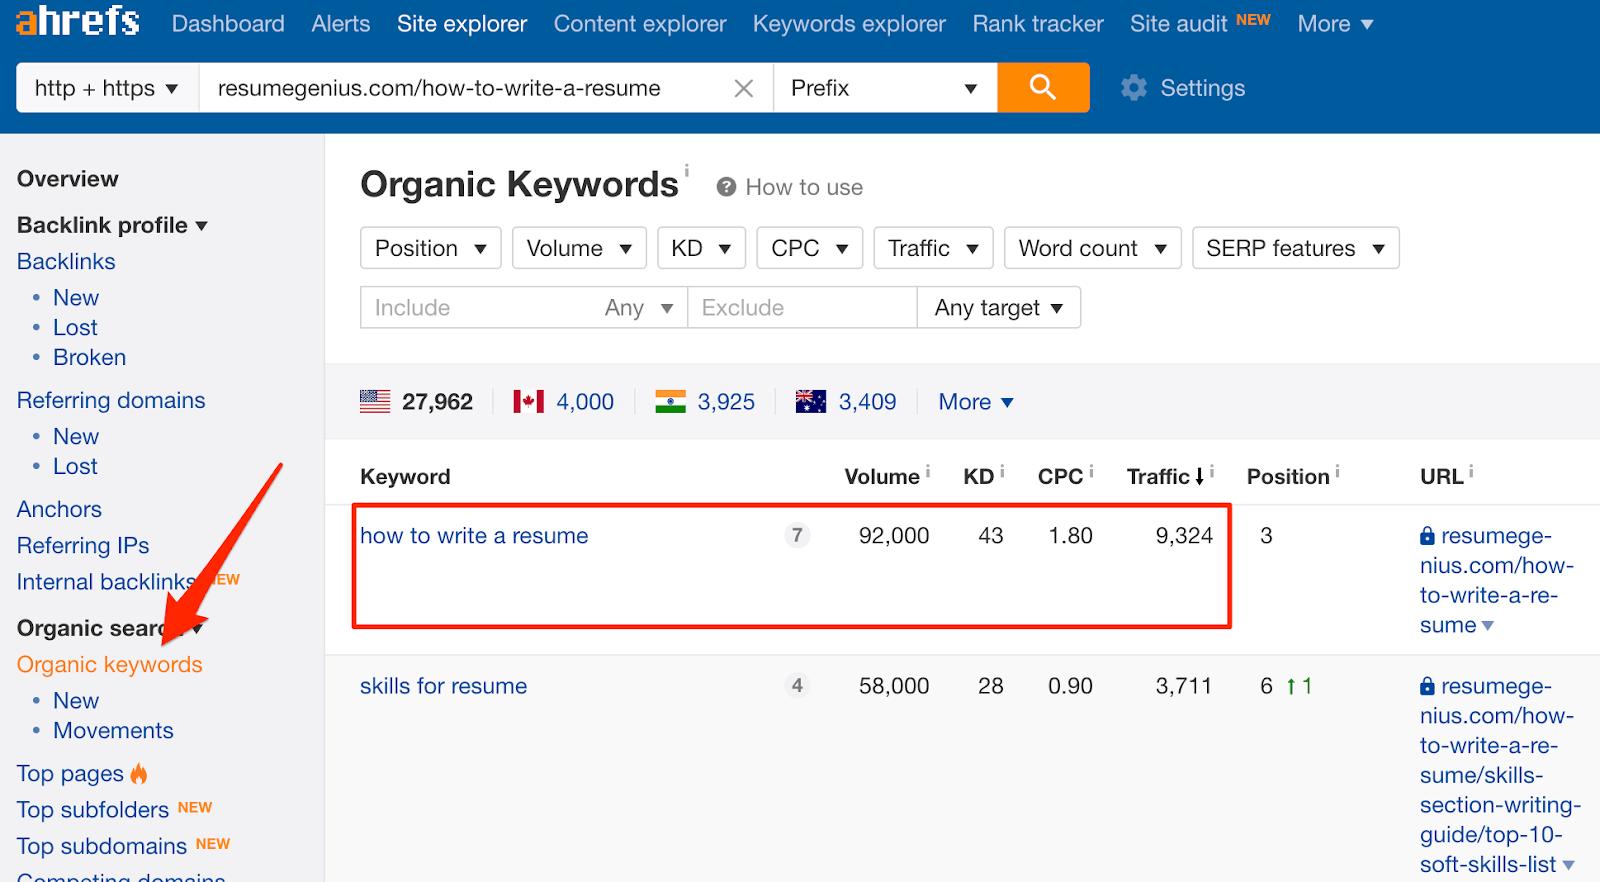 organic keywords resumegenius 1